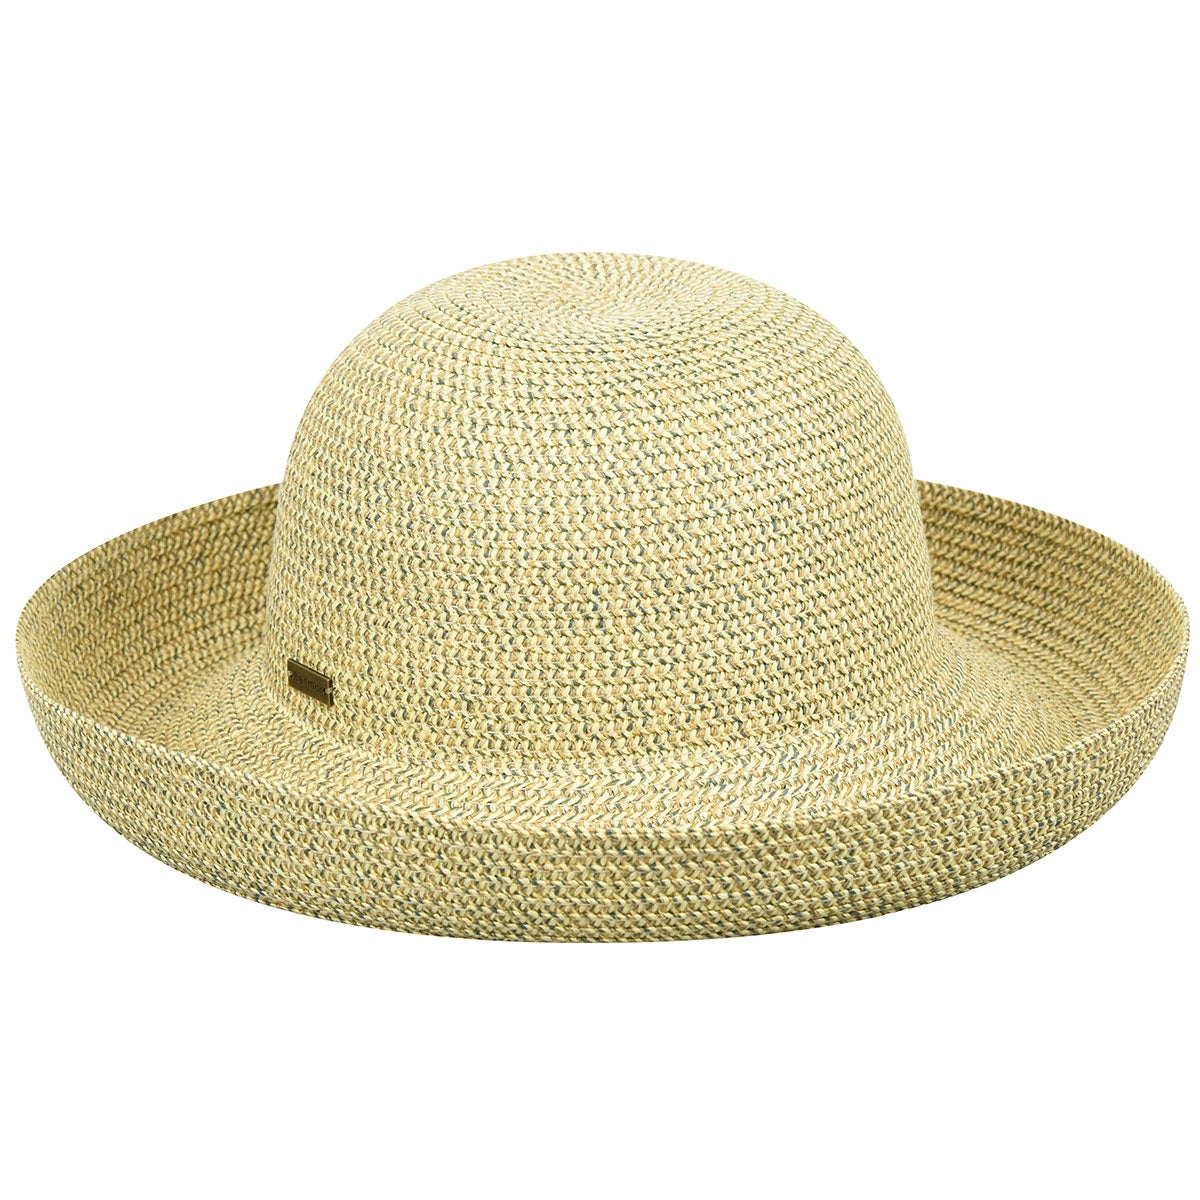 Betmar Classic Roll Up Hat in Desert,Natural